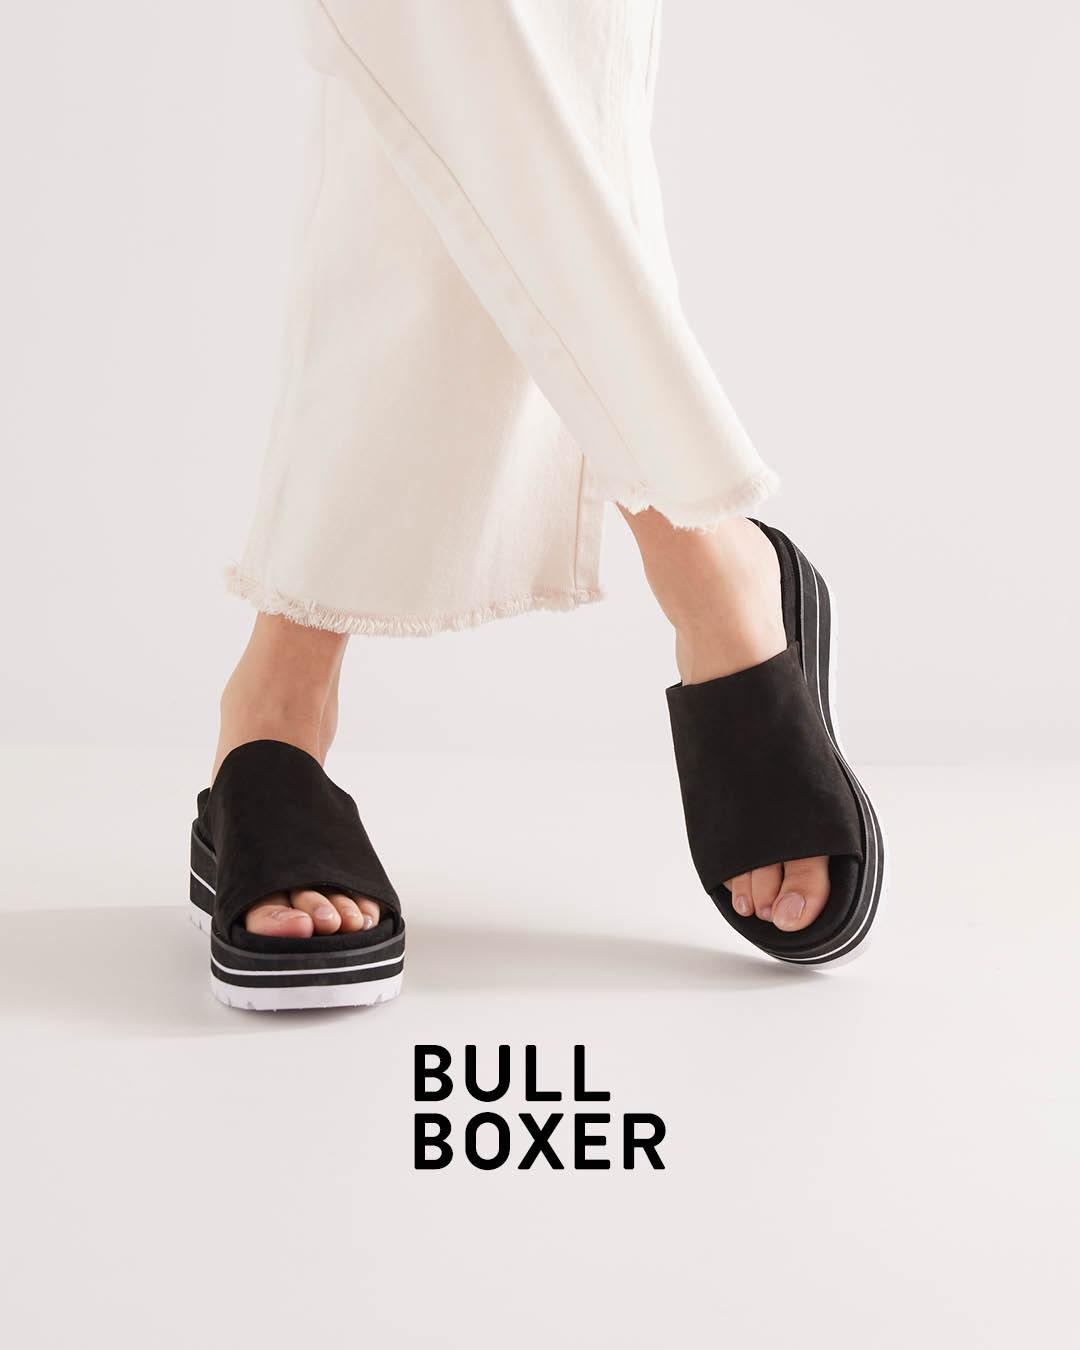 bullboxer summer